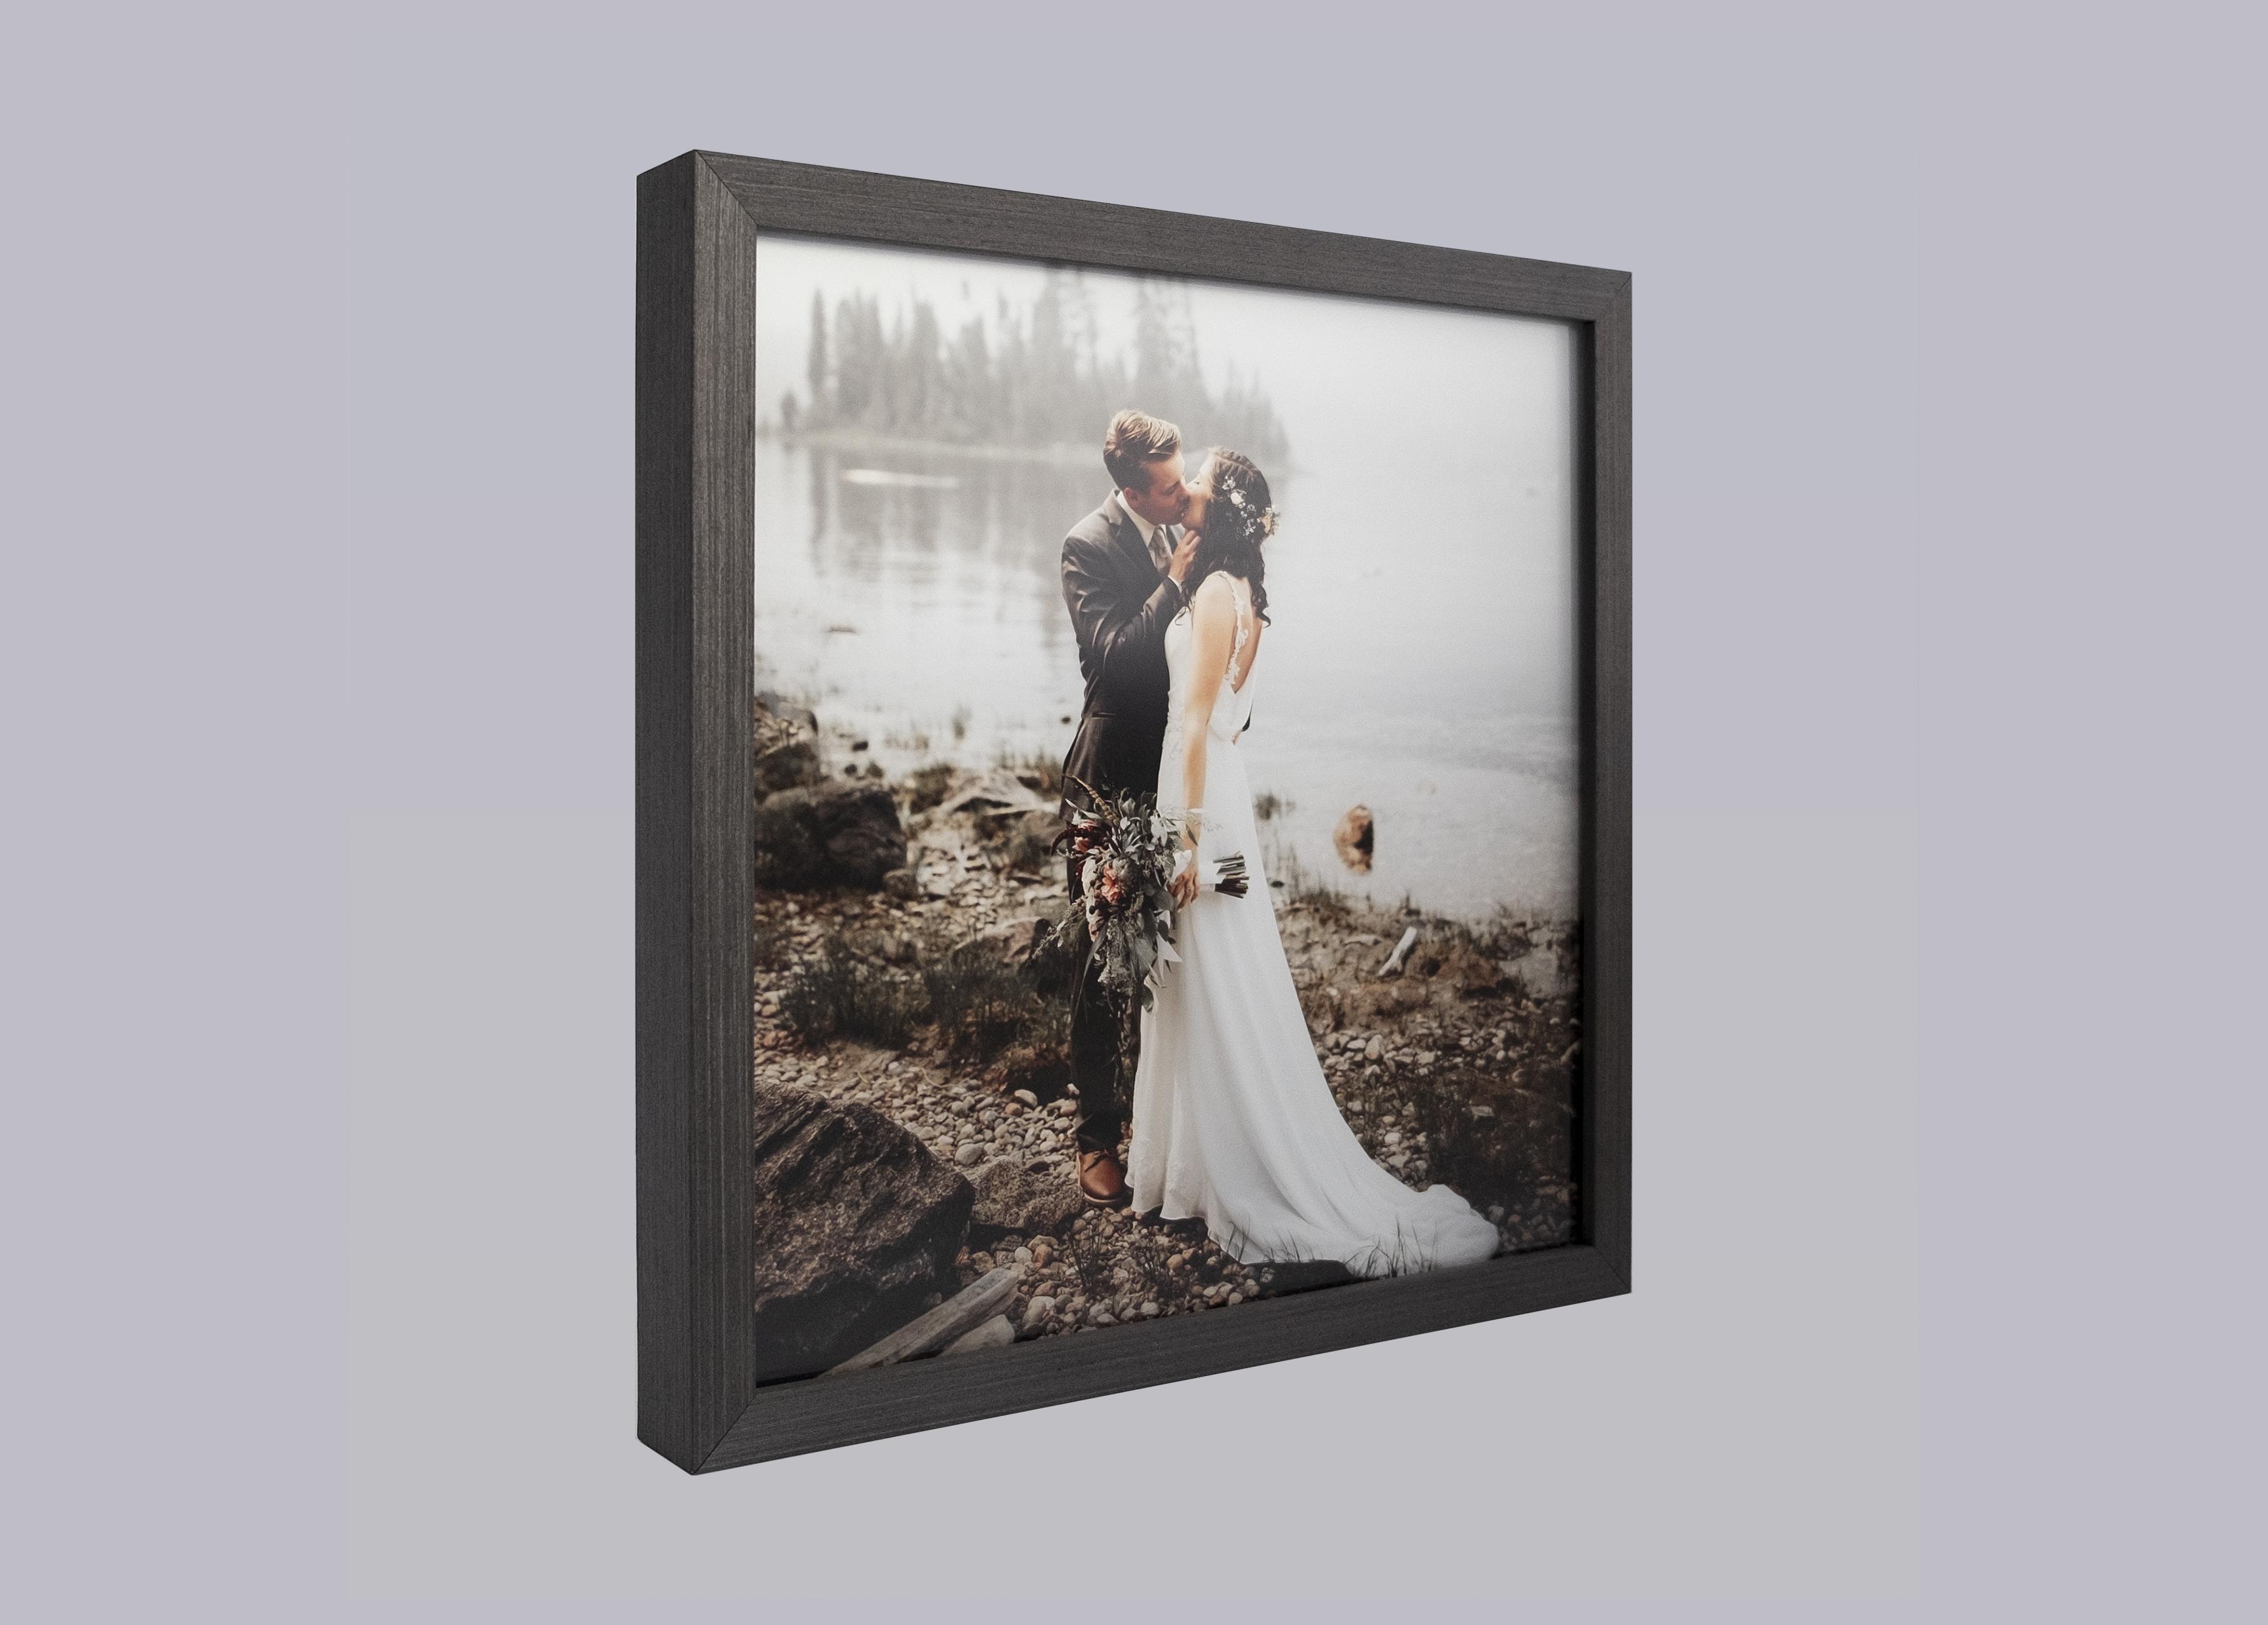 New Acrylic Box Frame